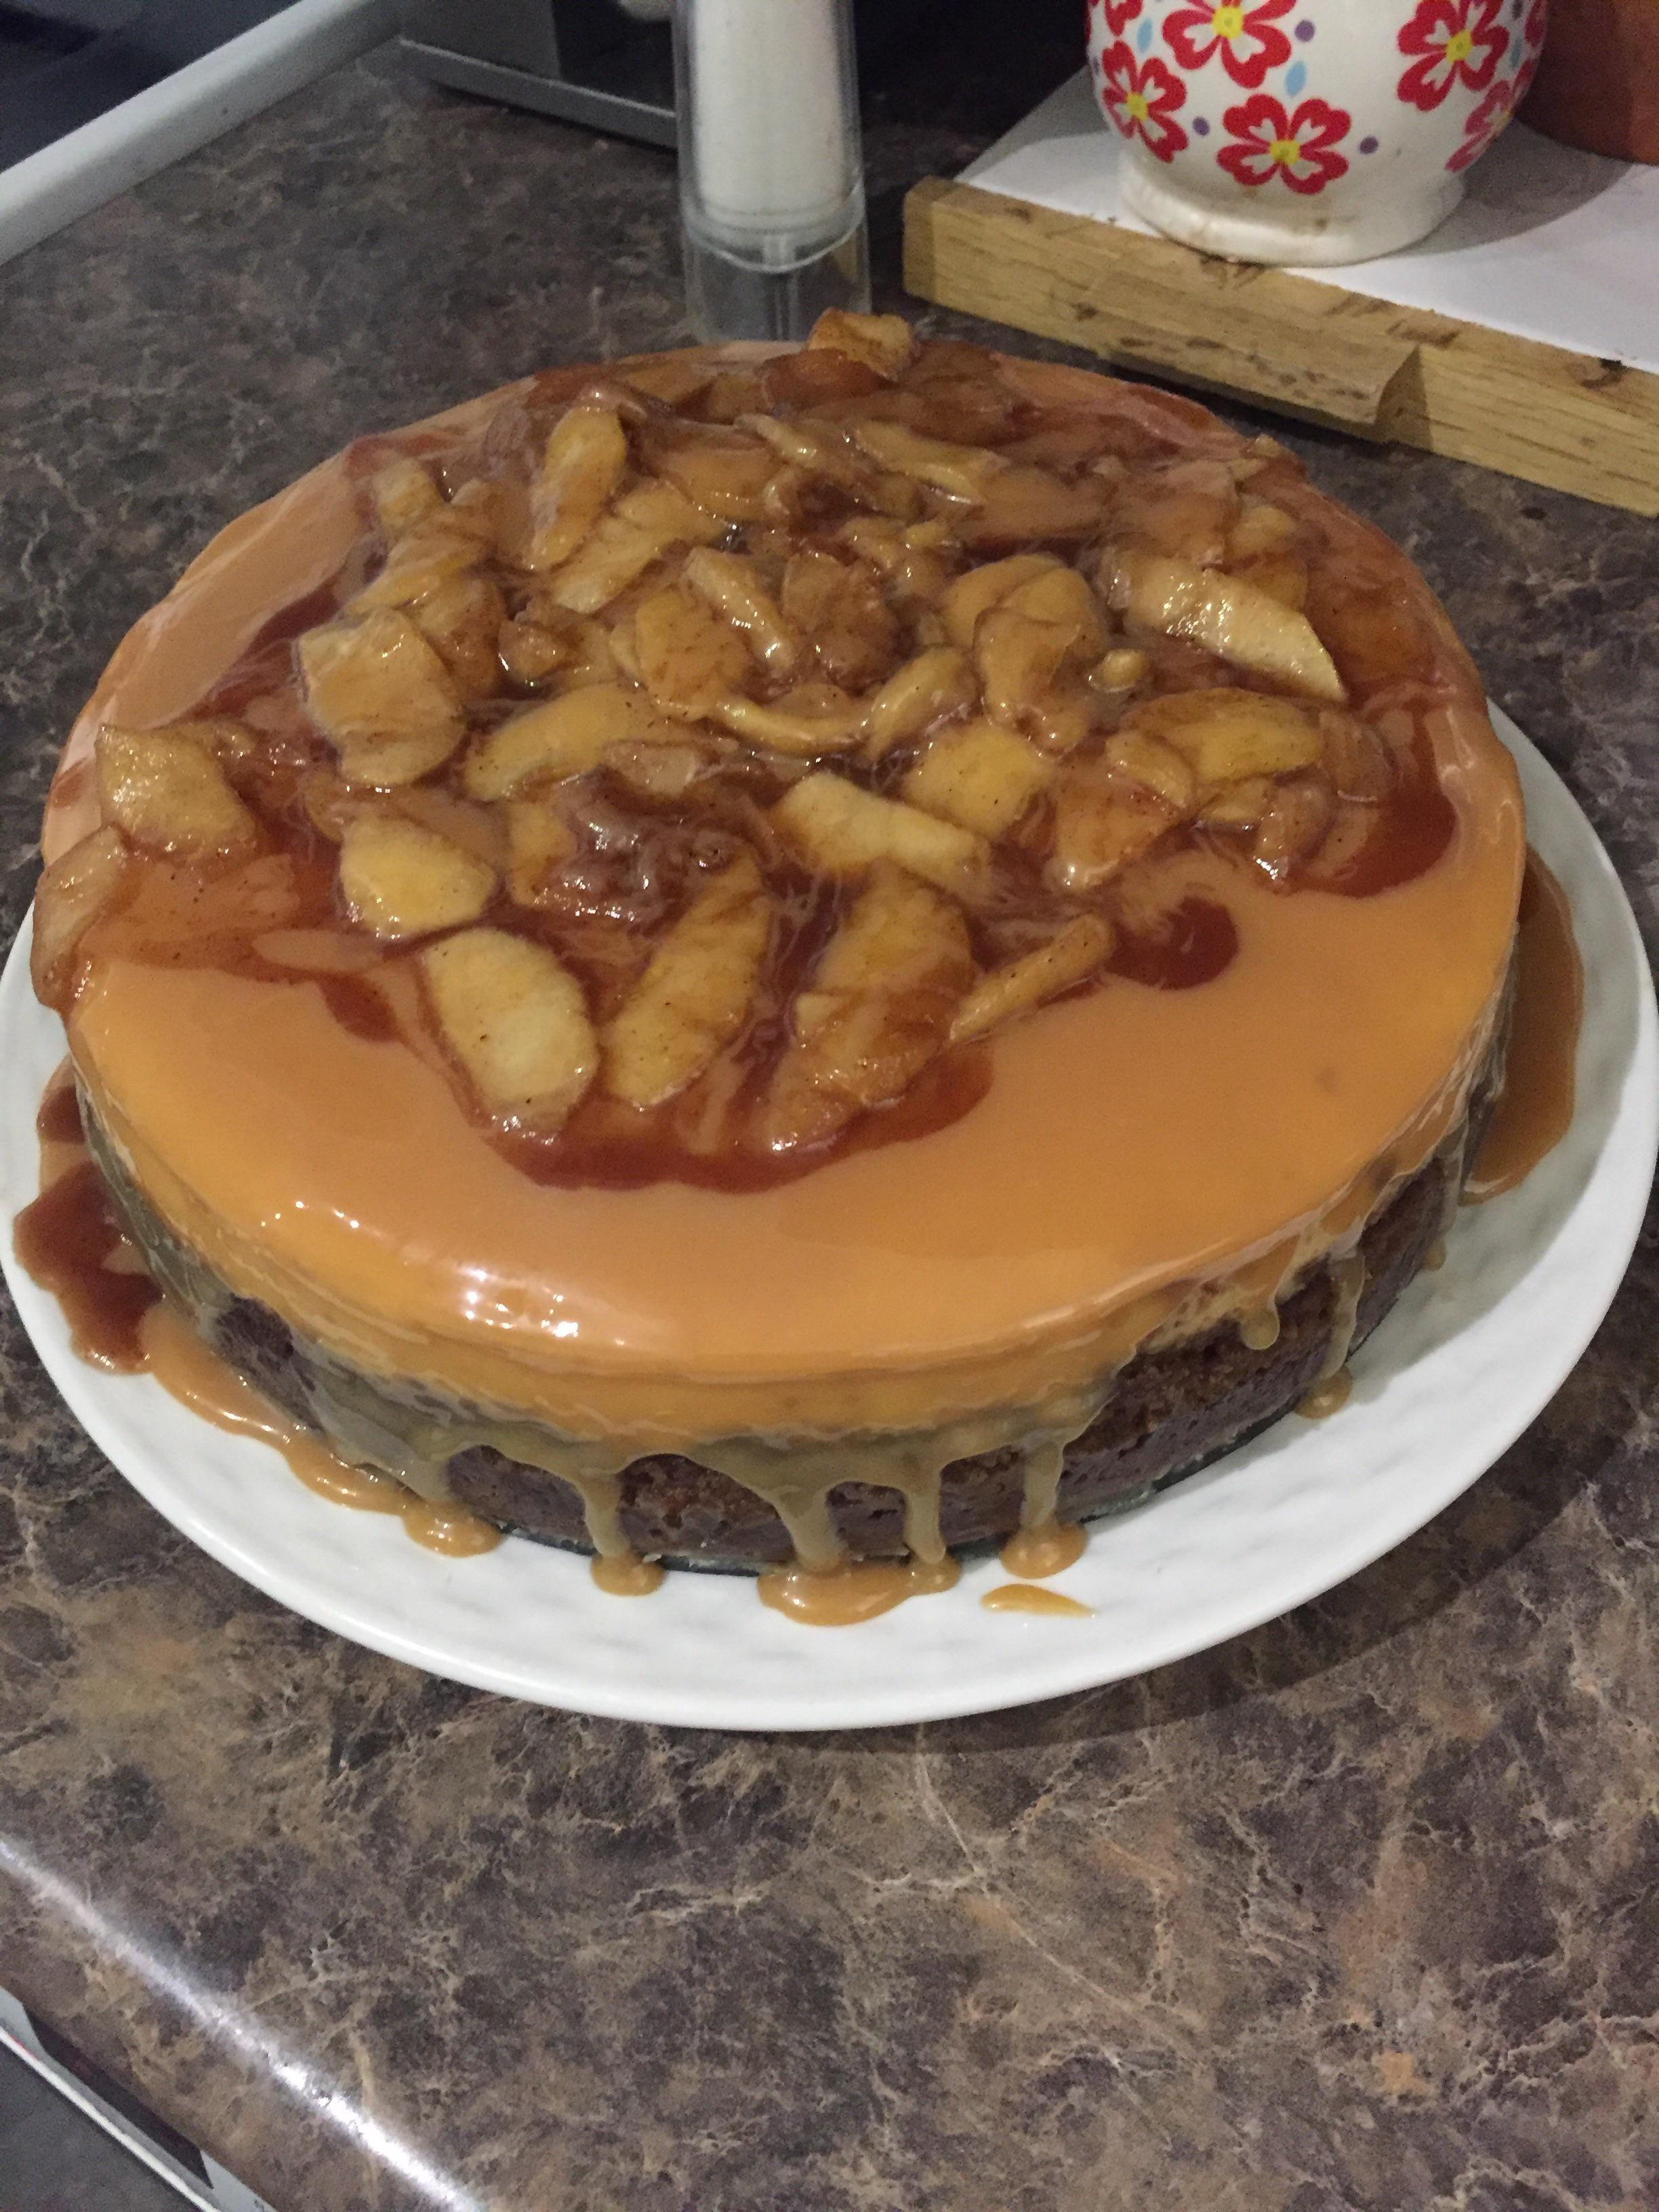 [homemade] Caramel Apple Cheesecake #food #caramelapplecheesecake [homemade] Caramel Apple Cheesecake #food #caramelapplecheesecake [homemade] Caramel Apple Cheesecake #food #caramelapplecheesecake [homemade] Caramel Apple Cheesecake #food #caramelapplecheesecake [homemade] Caramel Apple Cheesecake #food #caramelapplecheesecake [homemade] Caramel Apple Cheesecake #food #caramelapplecheesecake [homemade] Caramel Apple Cheesecake #food #caramelapplecheesecake [homemade] Caramel Apple Cheesecake #f #caramelapplecheesecake